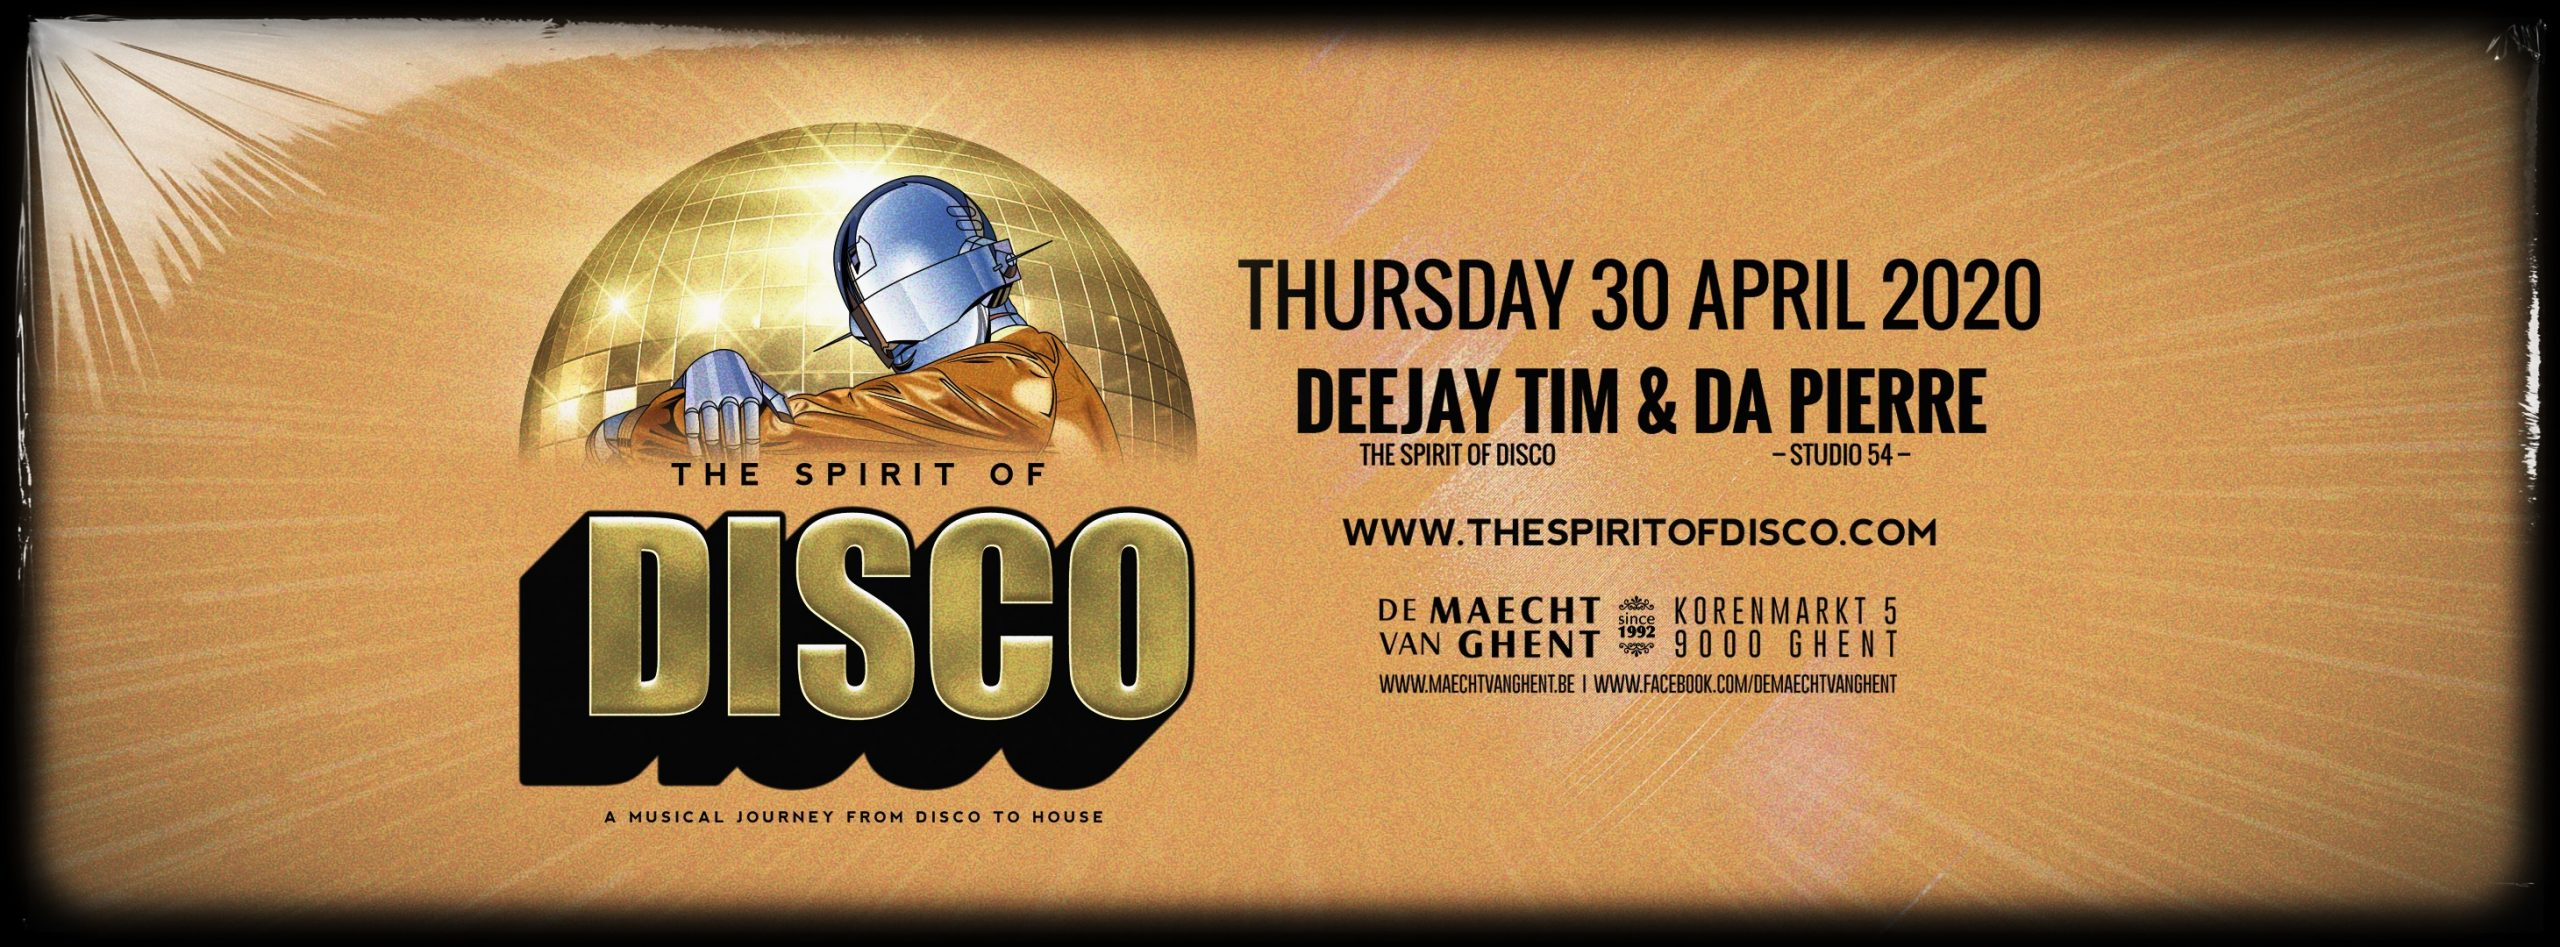 The Spirit of Disco